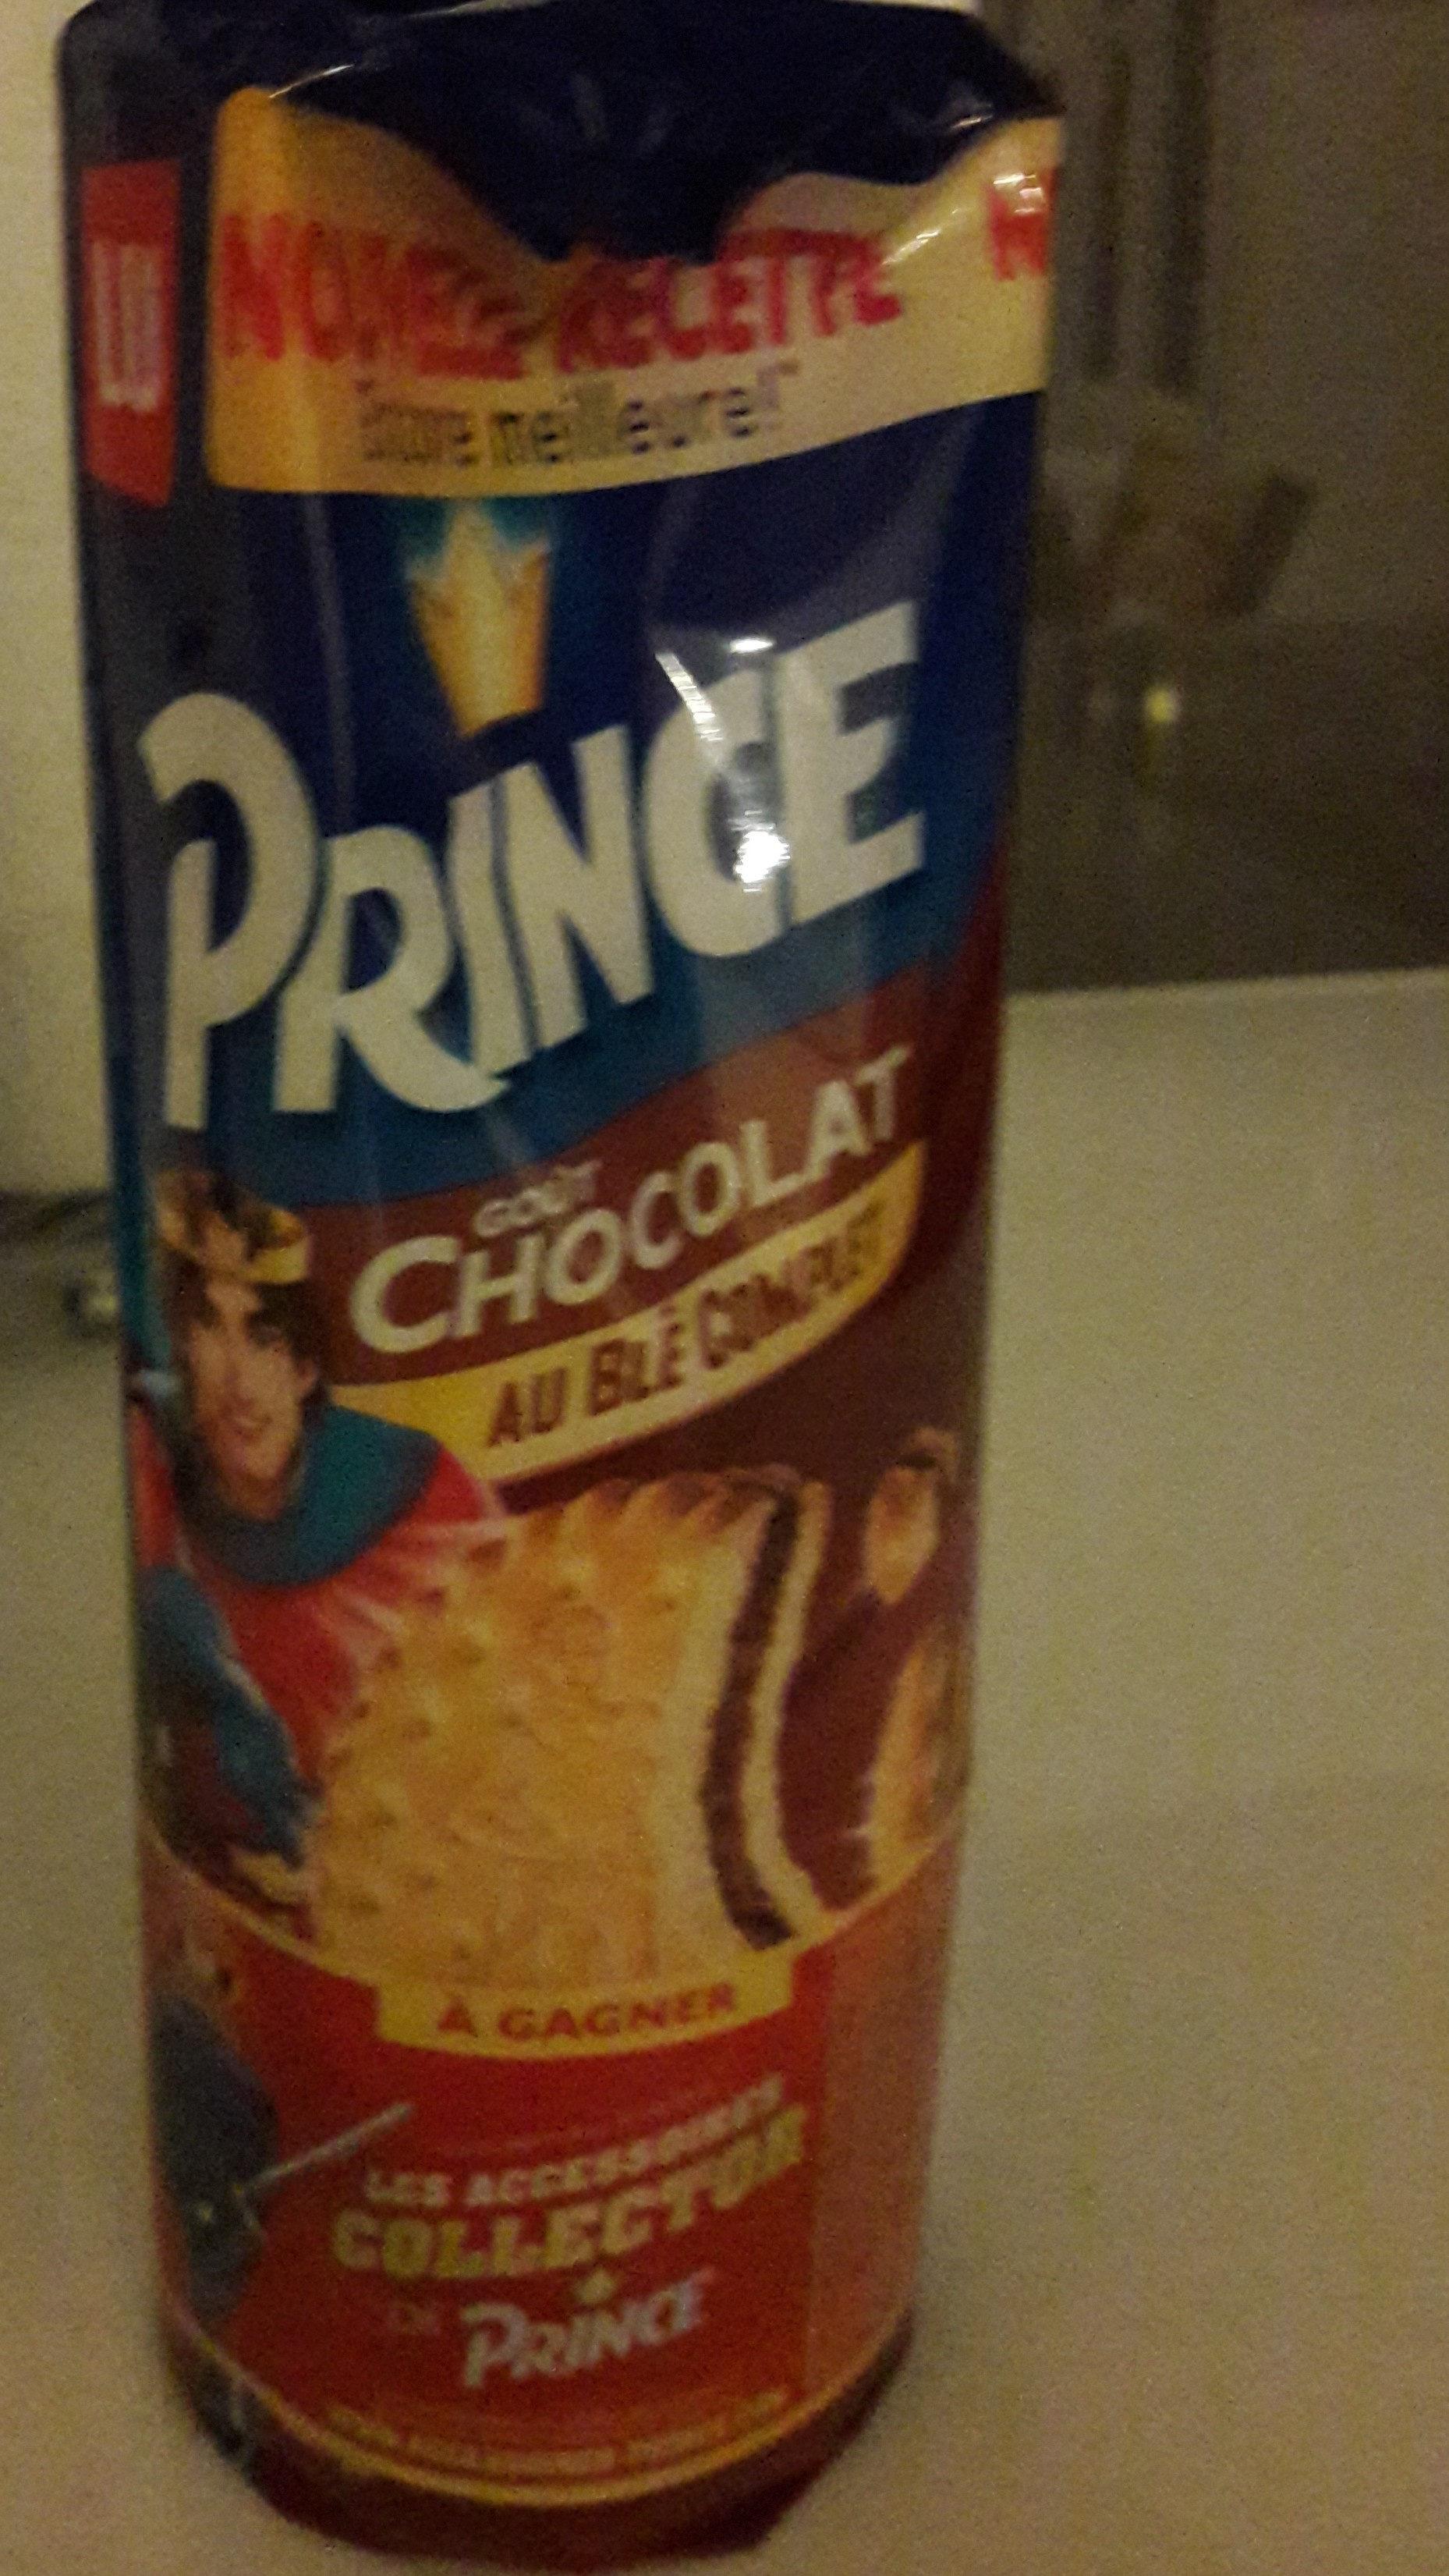 prince goût chocolat - Product - fr